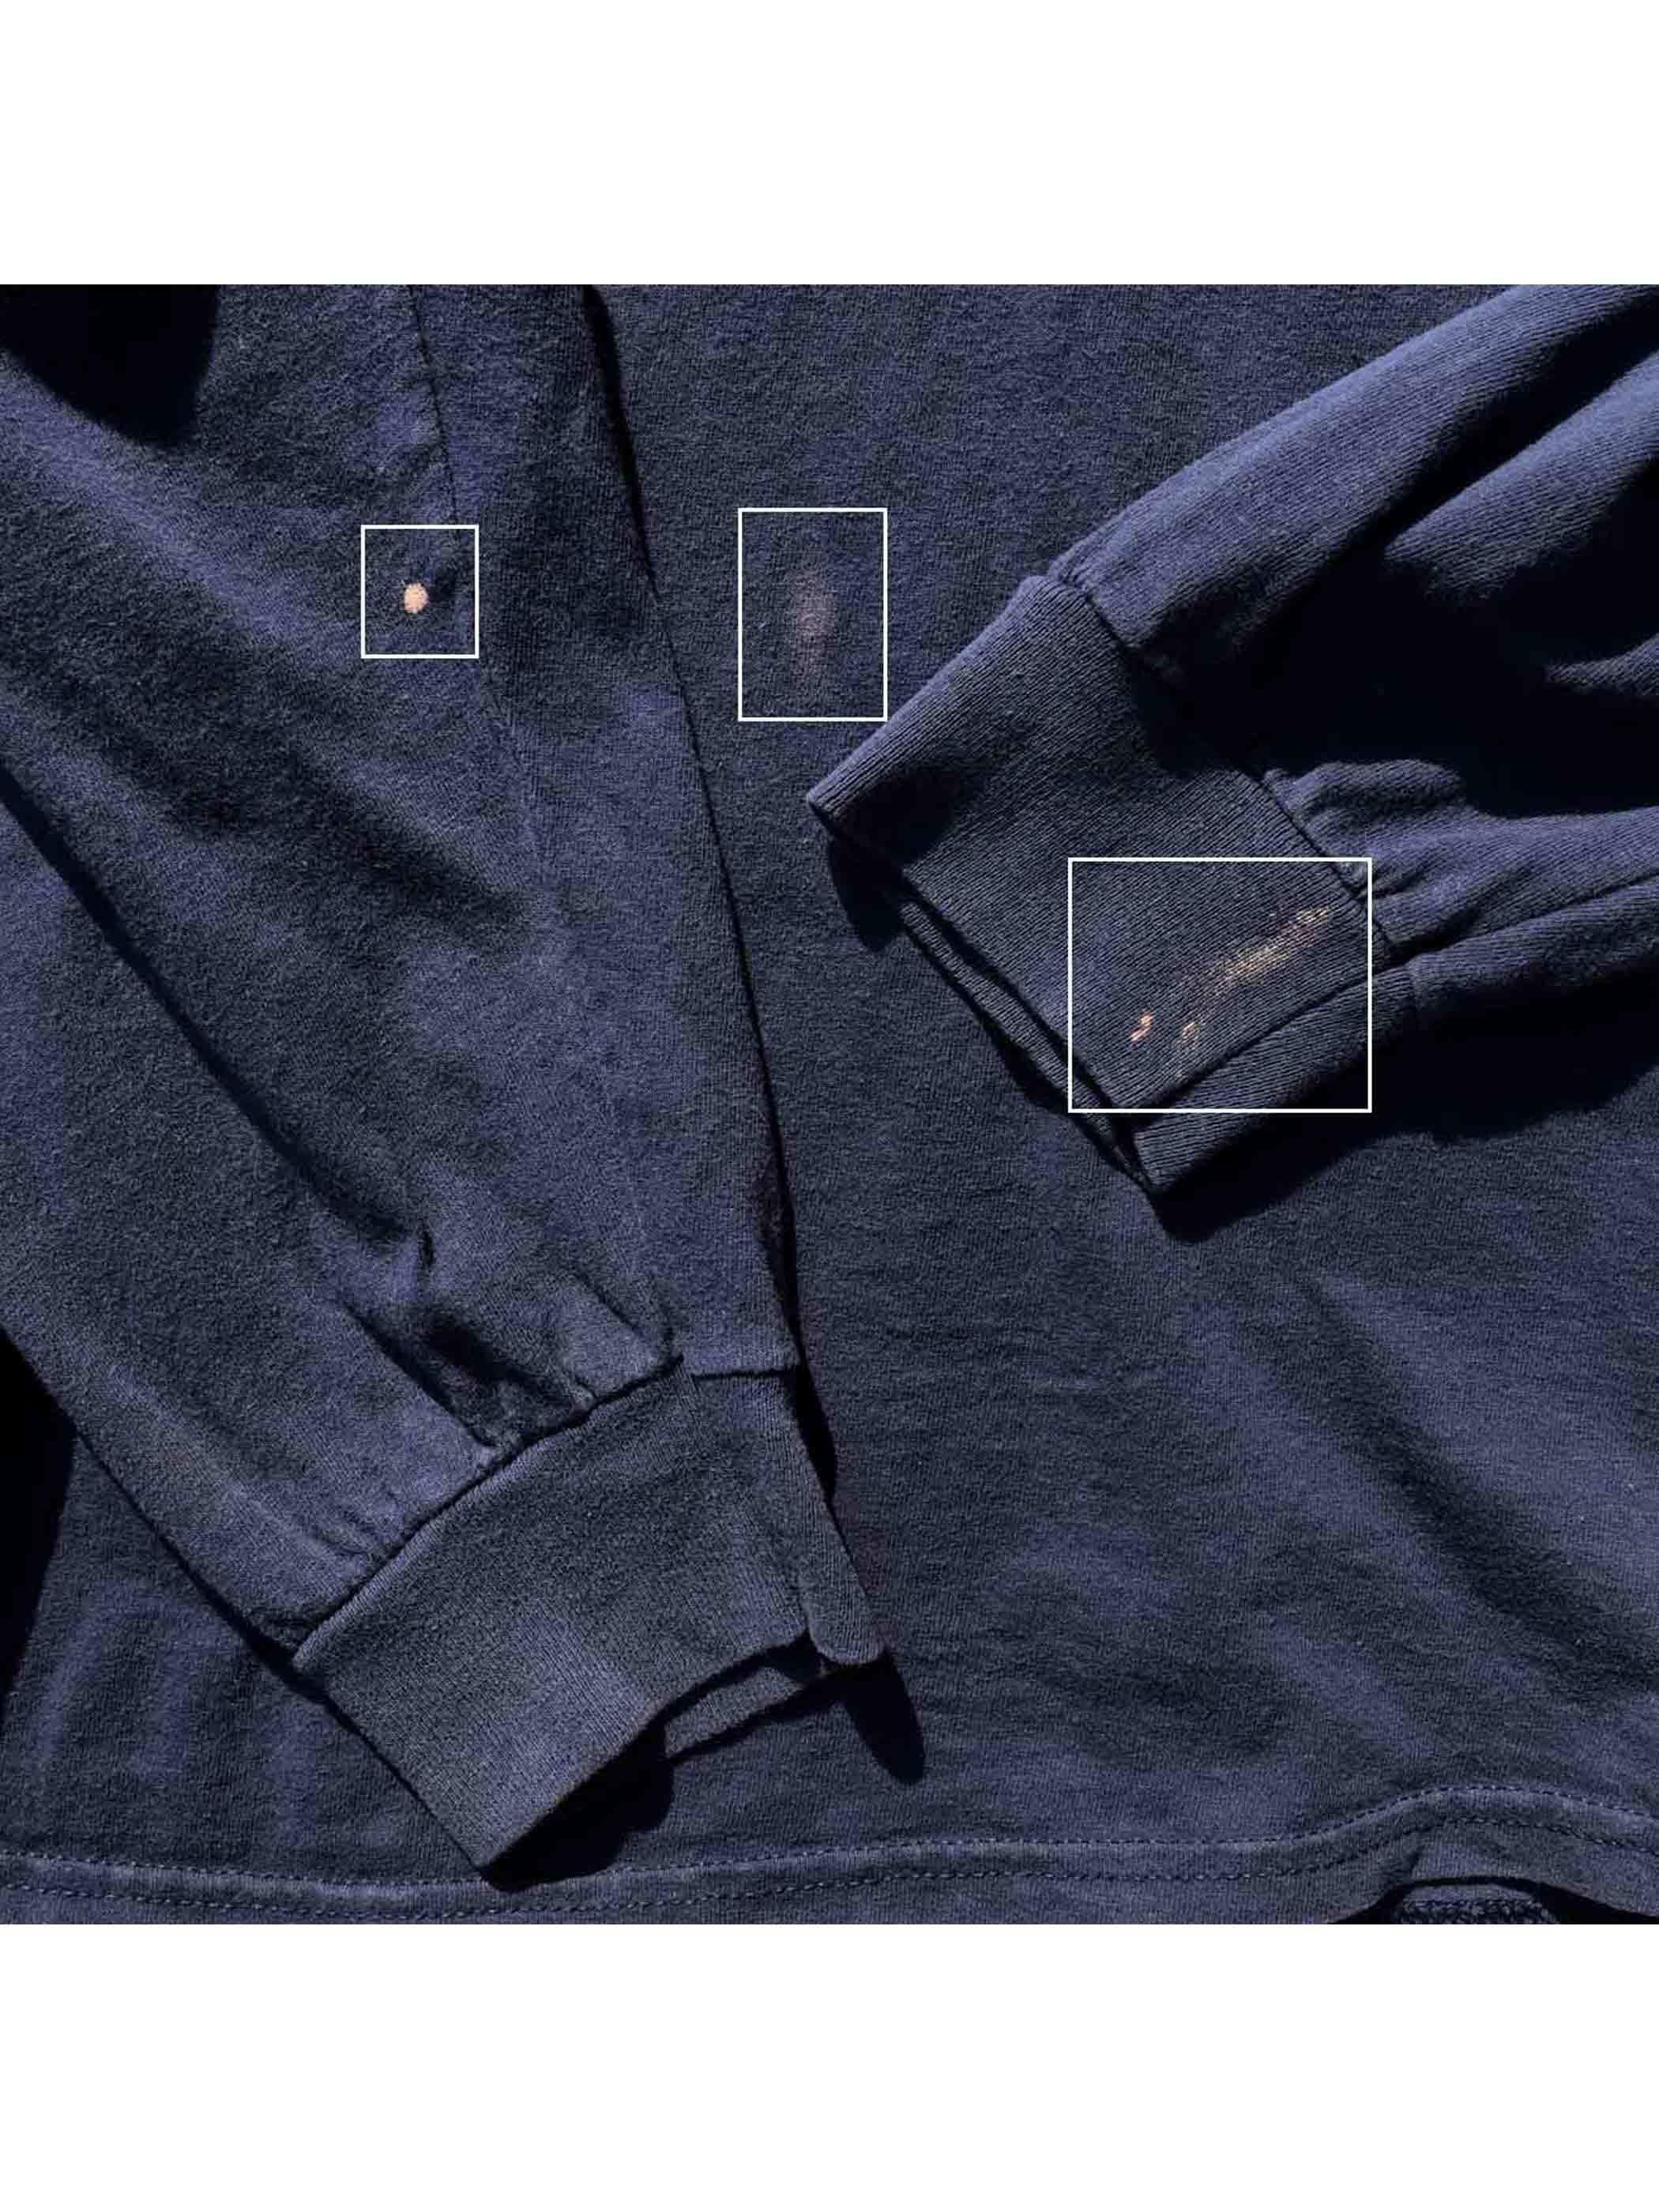 "00's GILDAN ""THE SALVATION ARMY"" 刺繍ロゴ ロングスリーブTシャツ [2XL]"